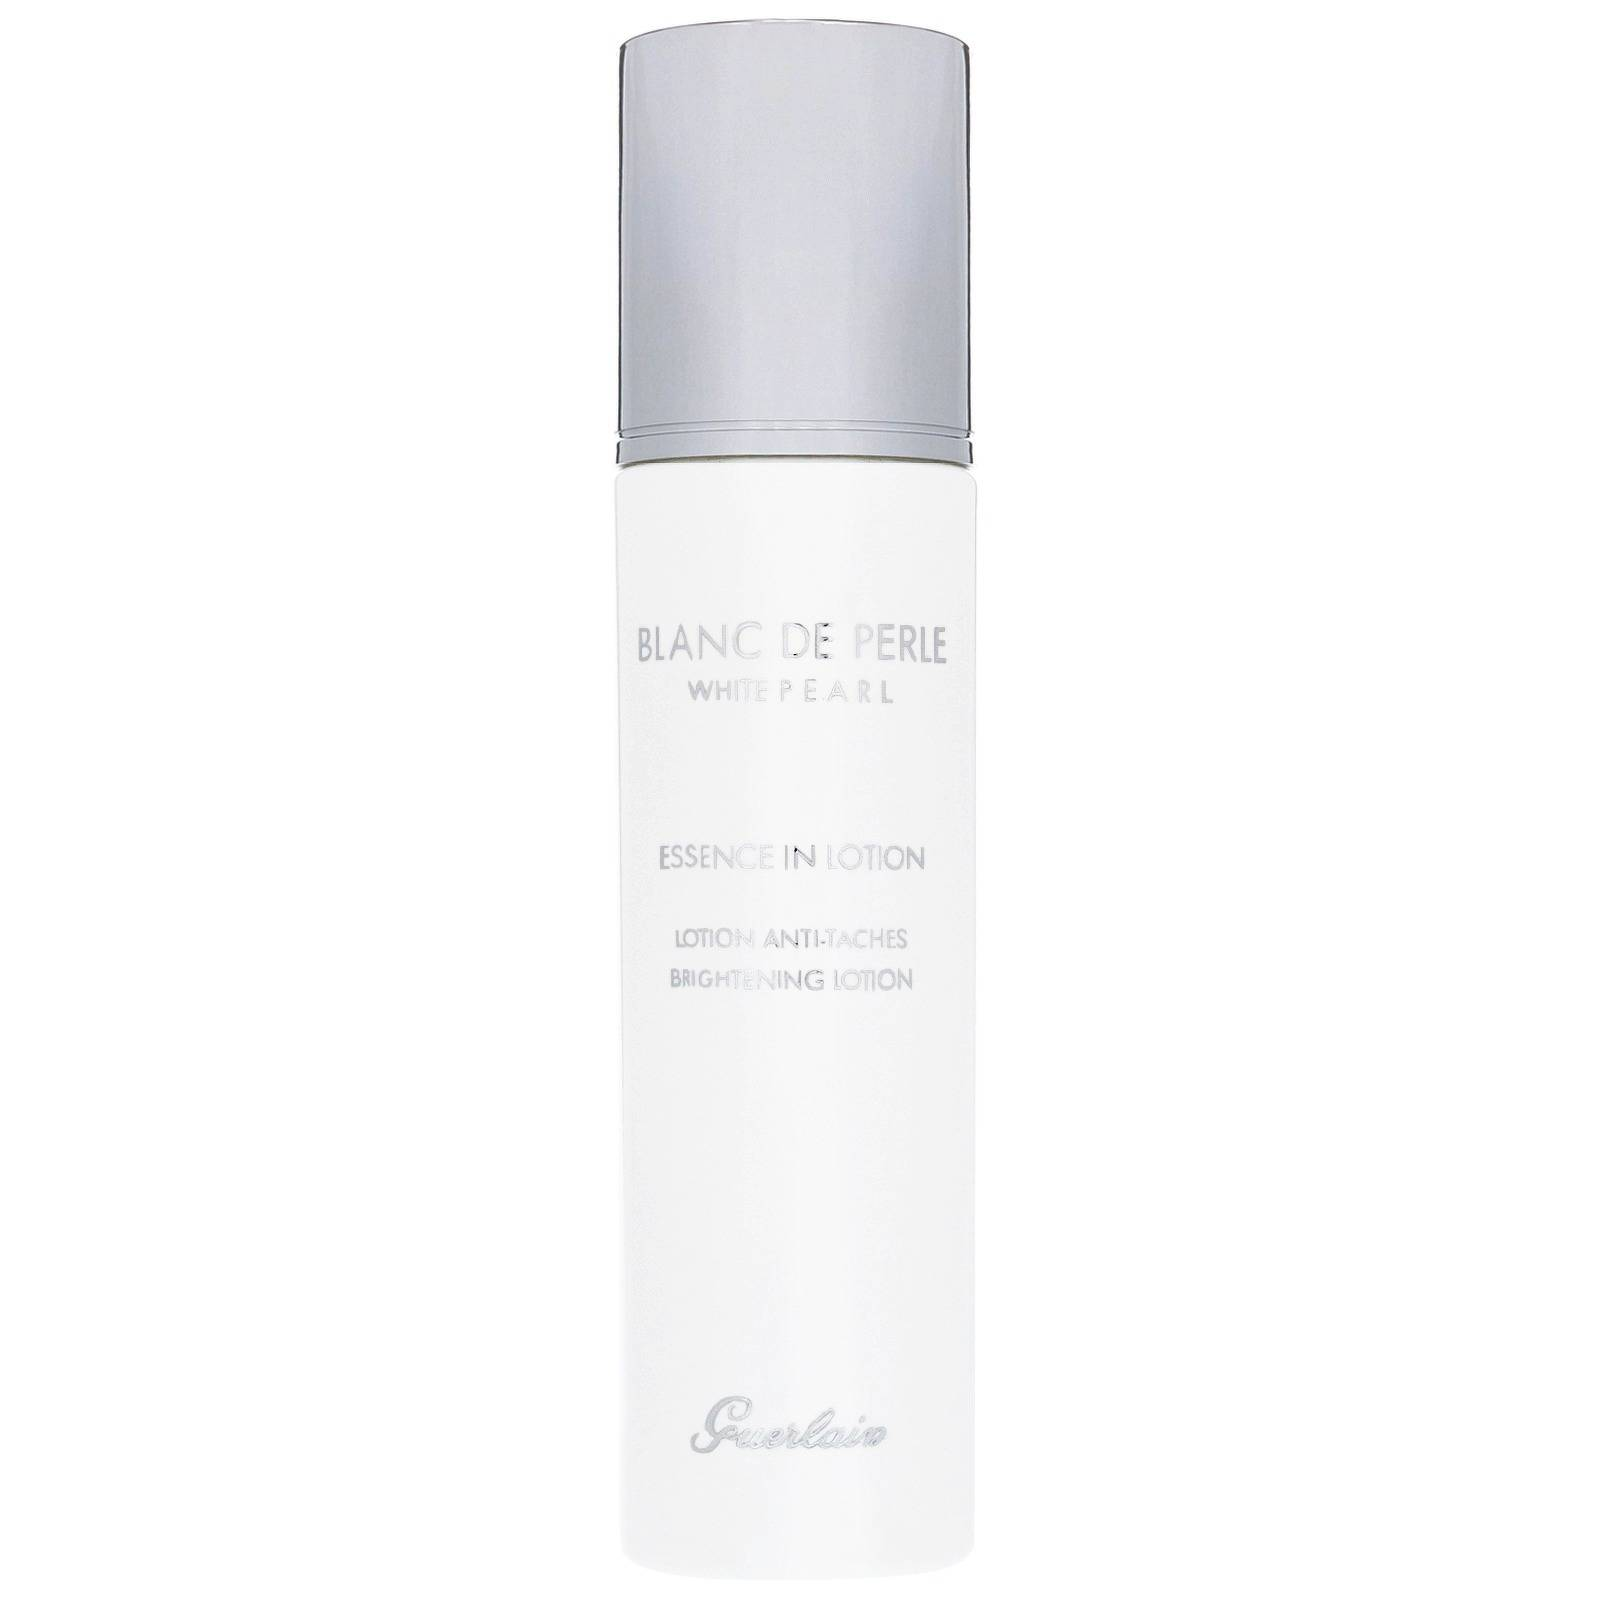 Guerlain - Blanc de Perle Brightening Lotion 200ml / 6.7 oz. for Women